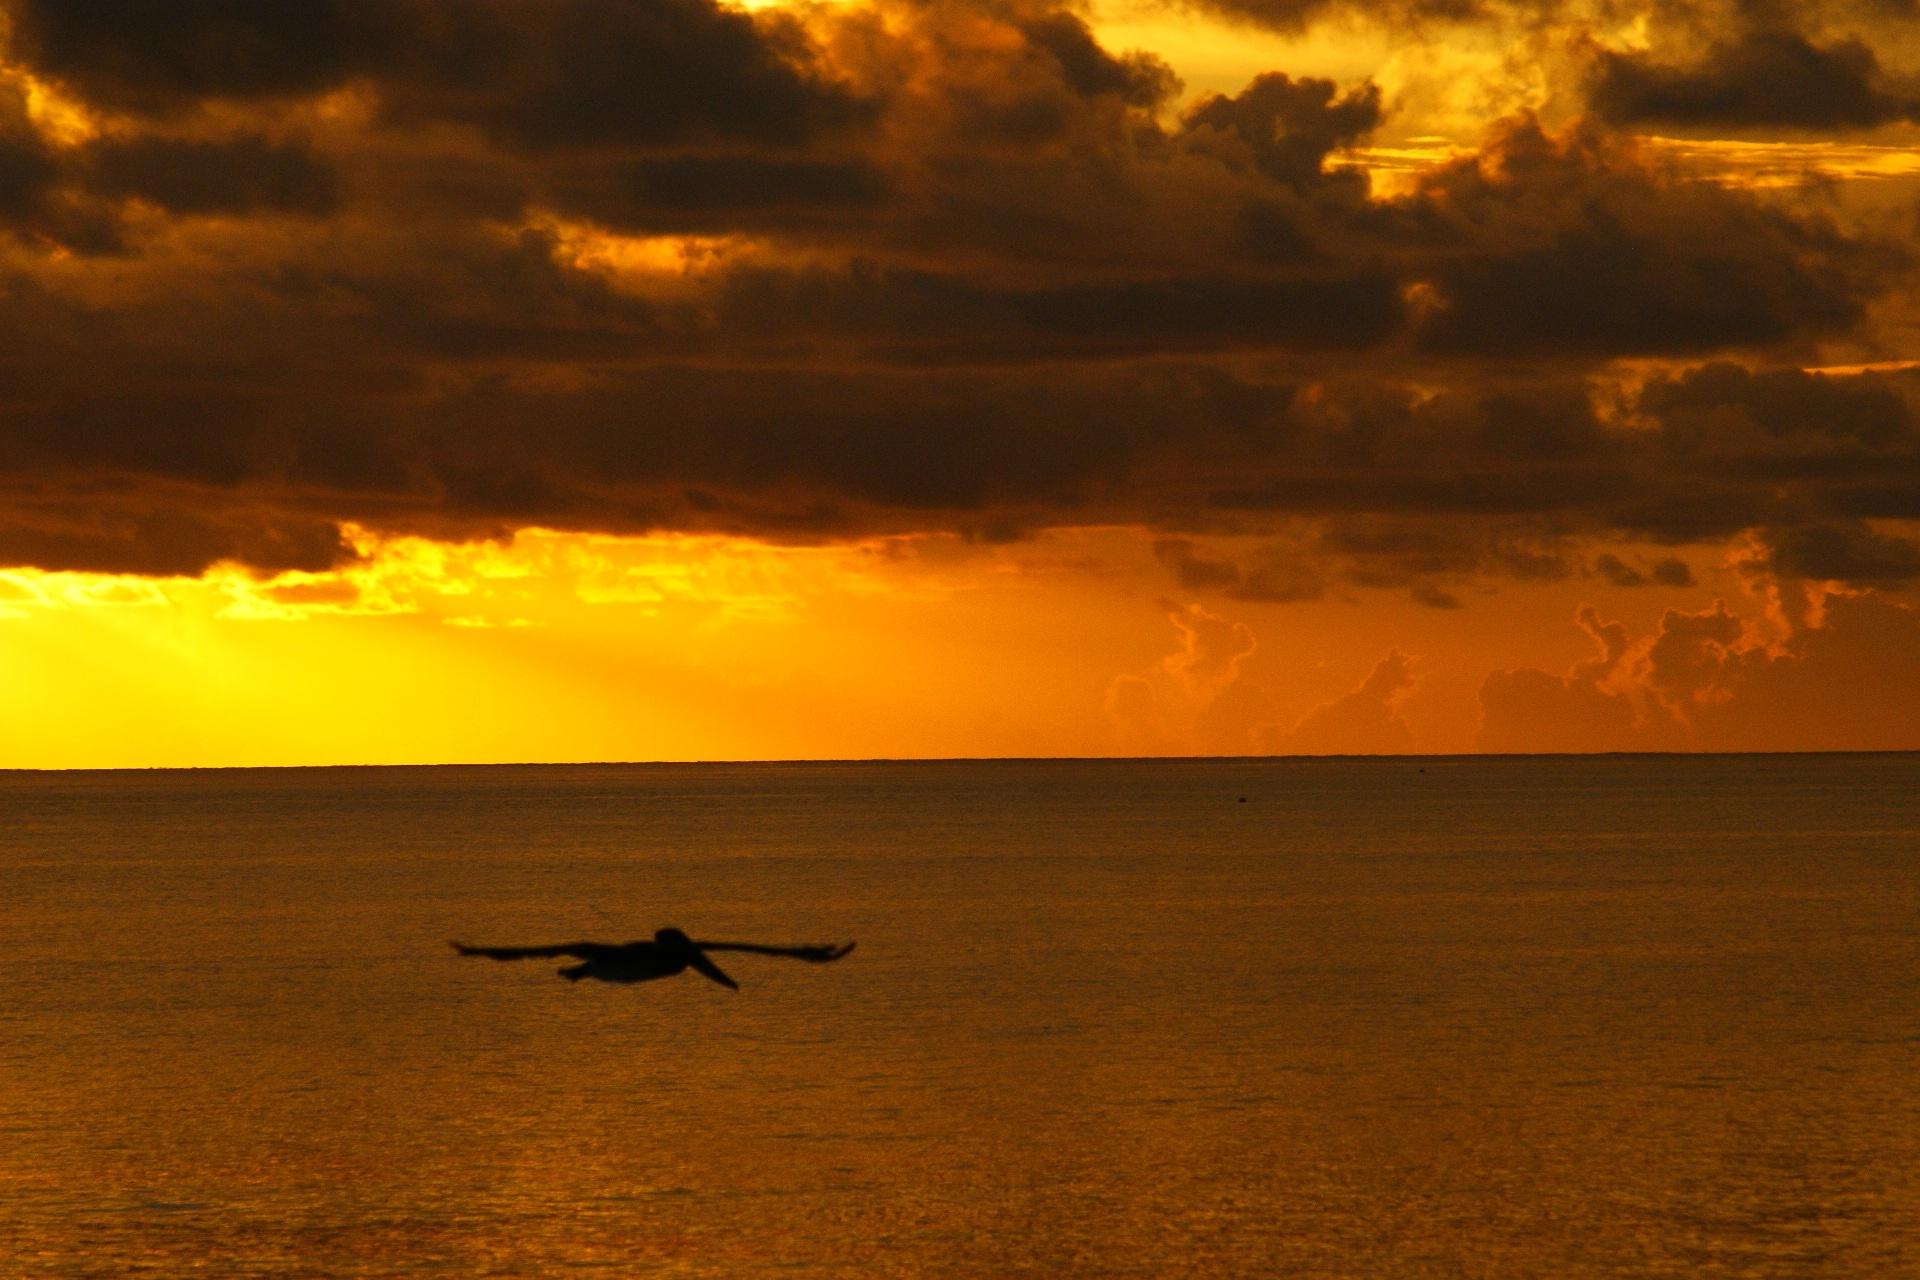 El Sol de Miami. sunrise/sunset.  #elsoldemiami #miamibeach  by delgado.babby